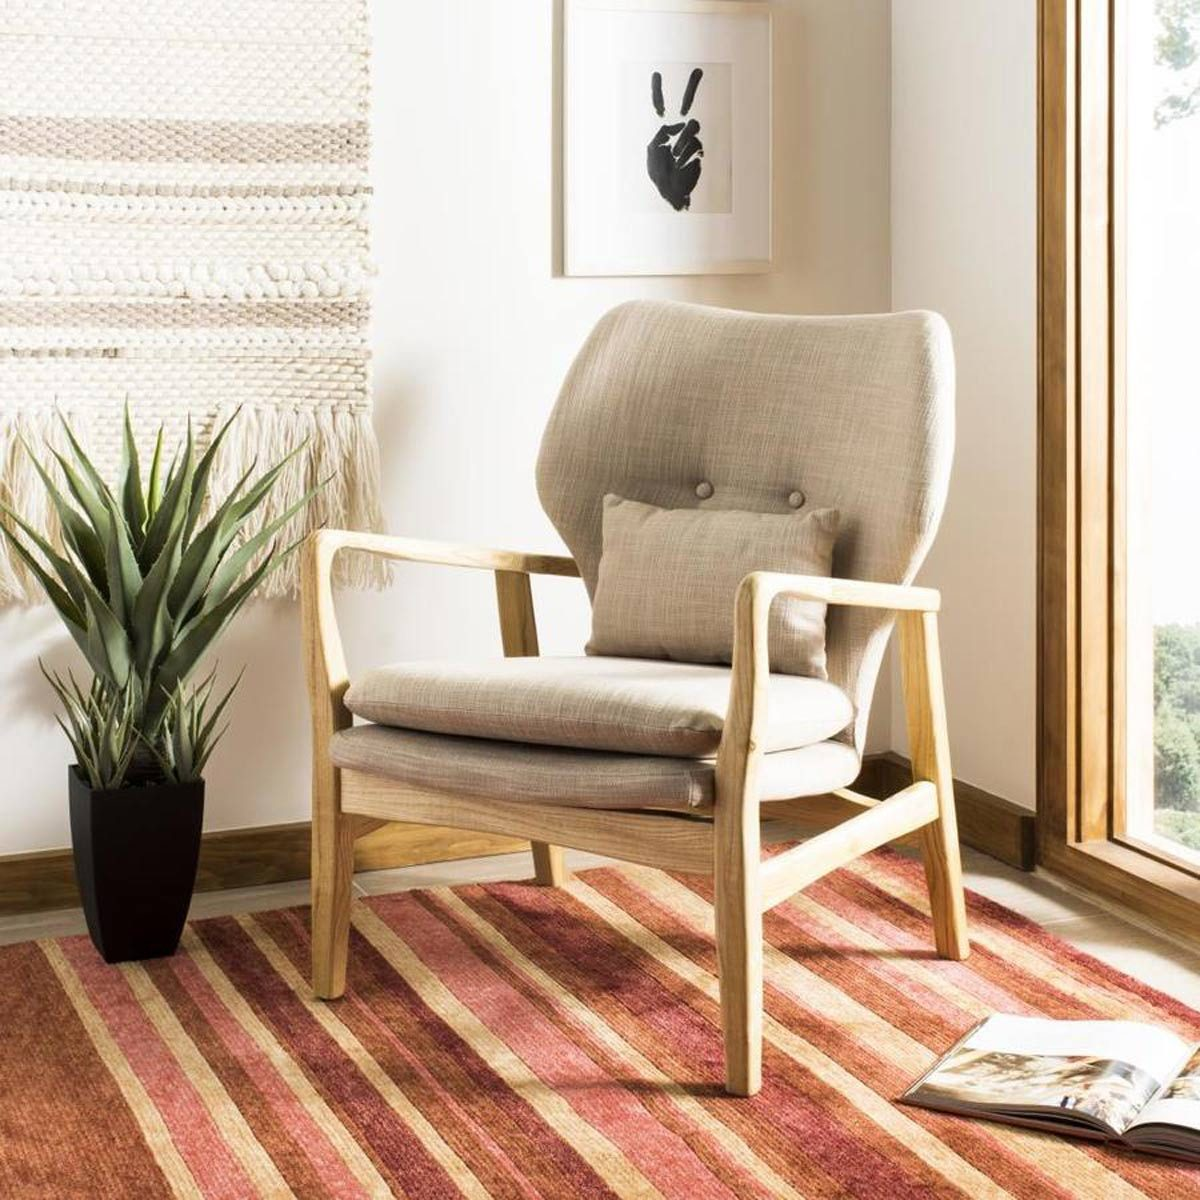 Safavieh Tarly Scandinavian Beige/Natural Accent Chair